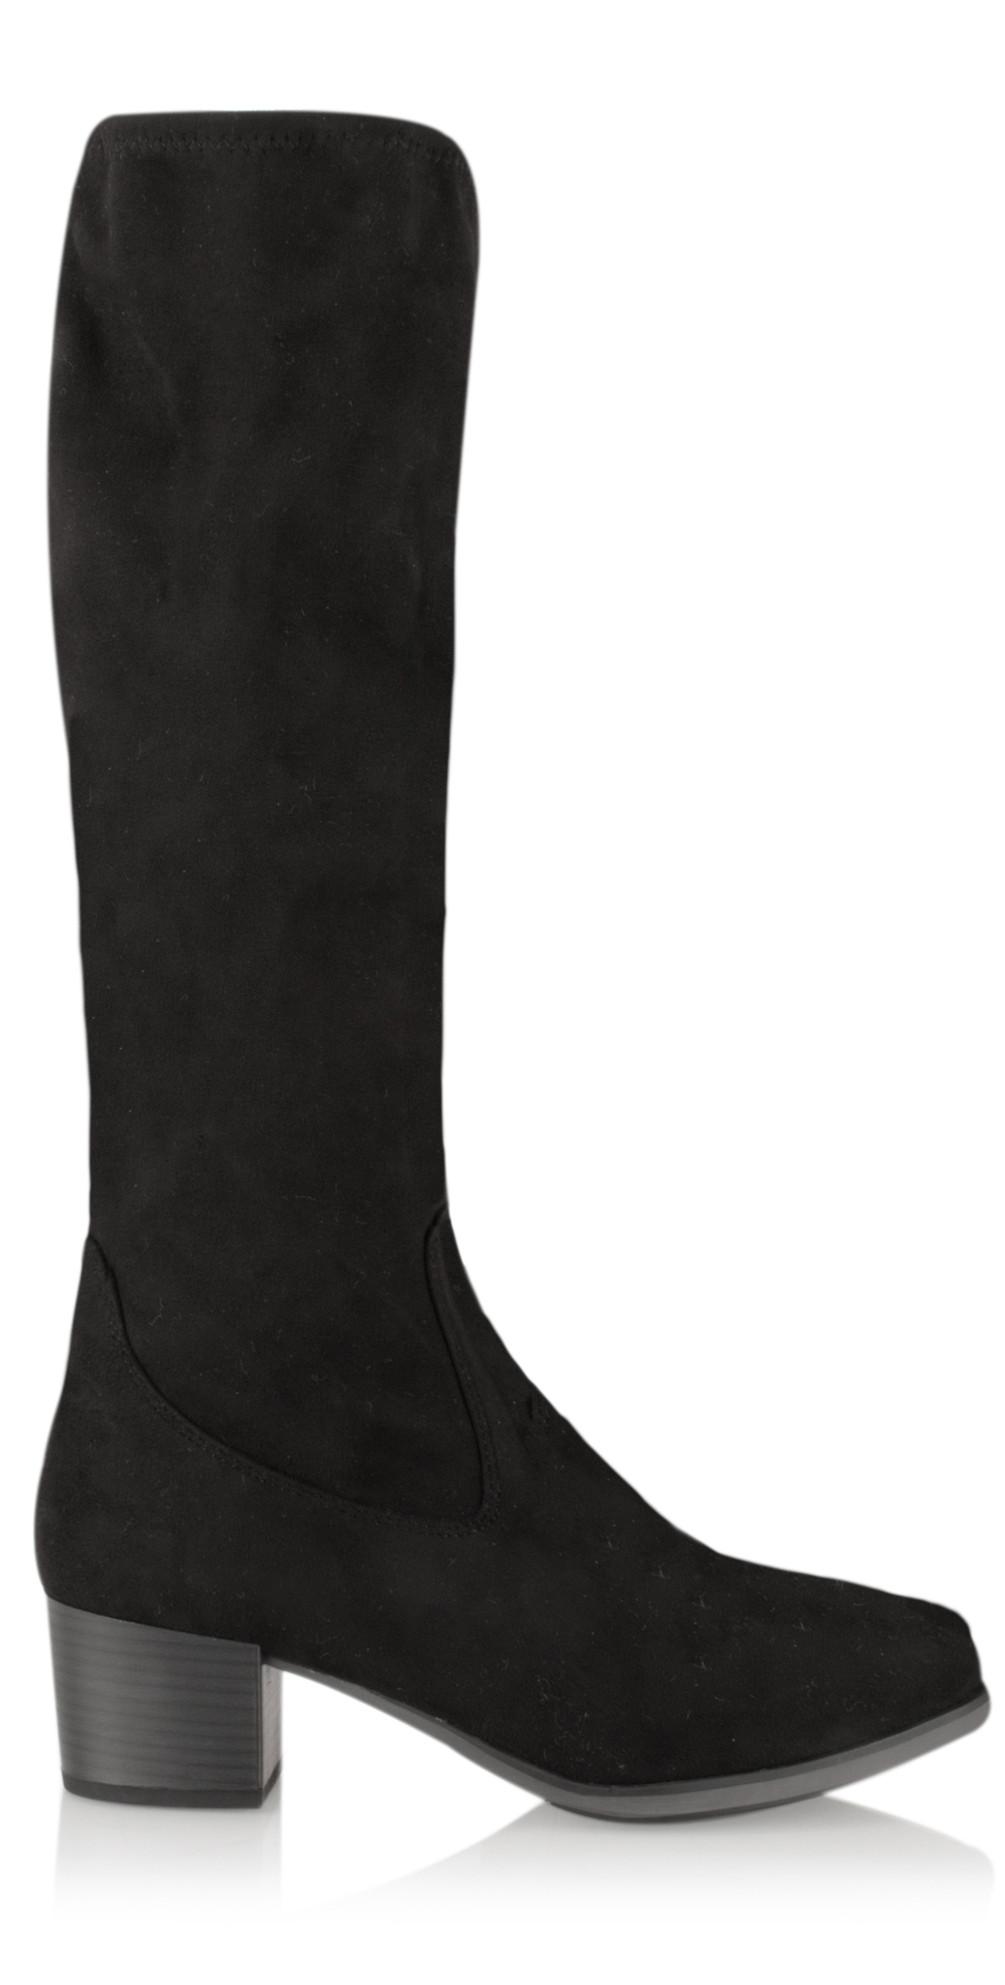 38c6dd288db1 Caprice Footwear Faux Suede Long Stretch Block Heel Boot in Black